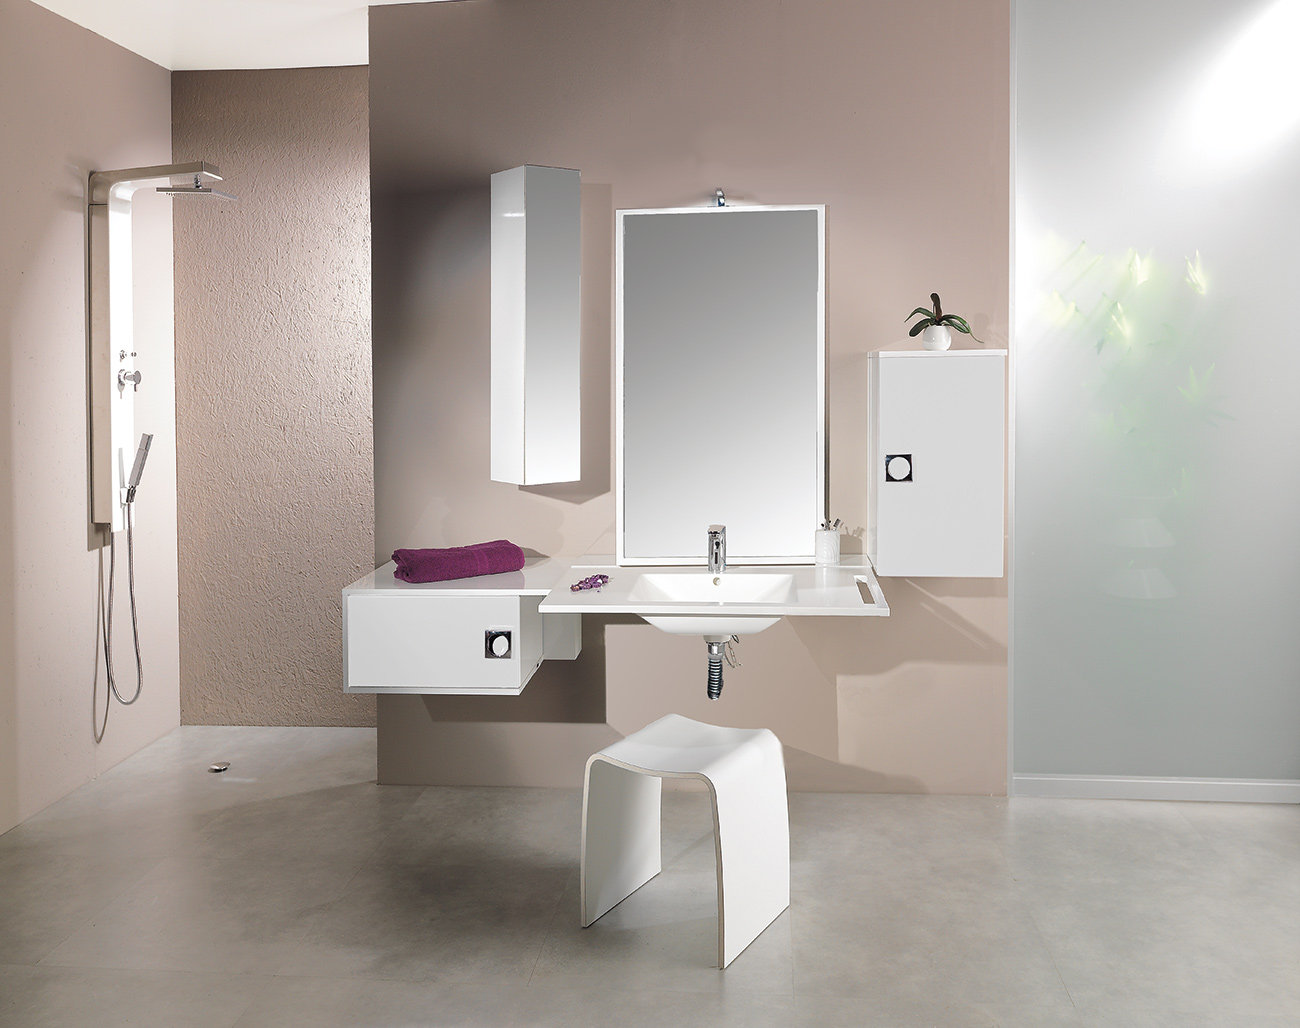 Forgiarini - Salle de bain pmr ...